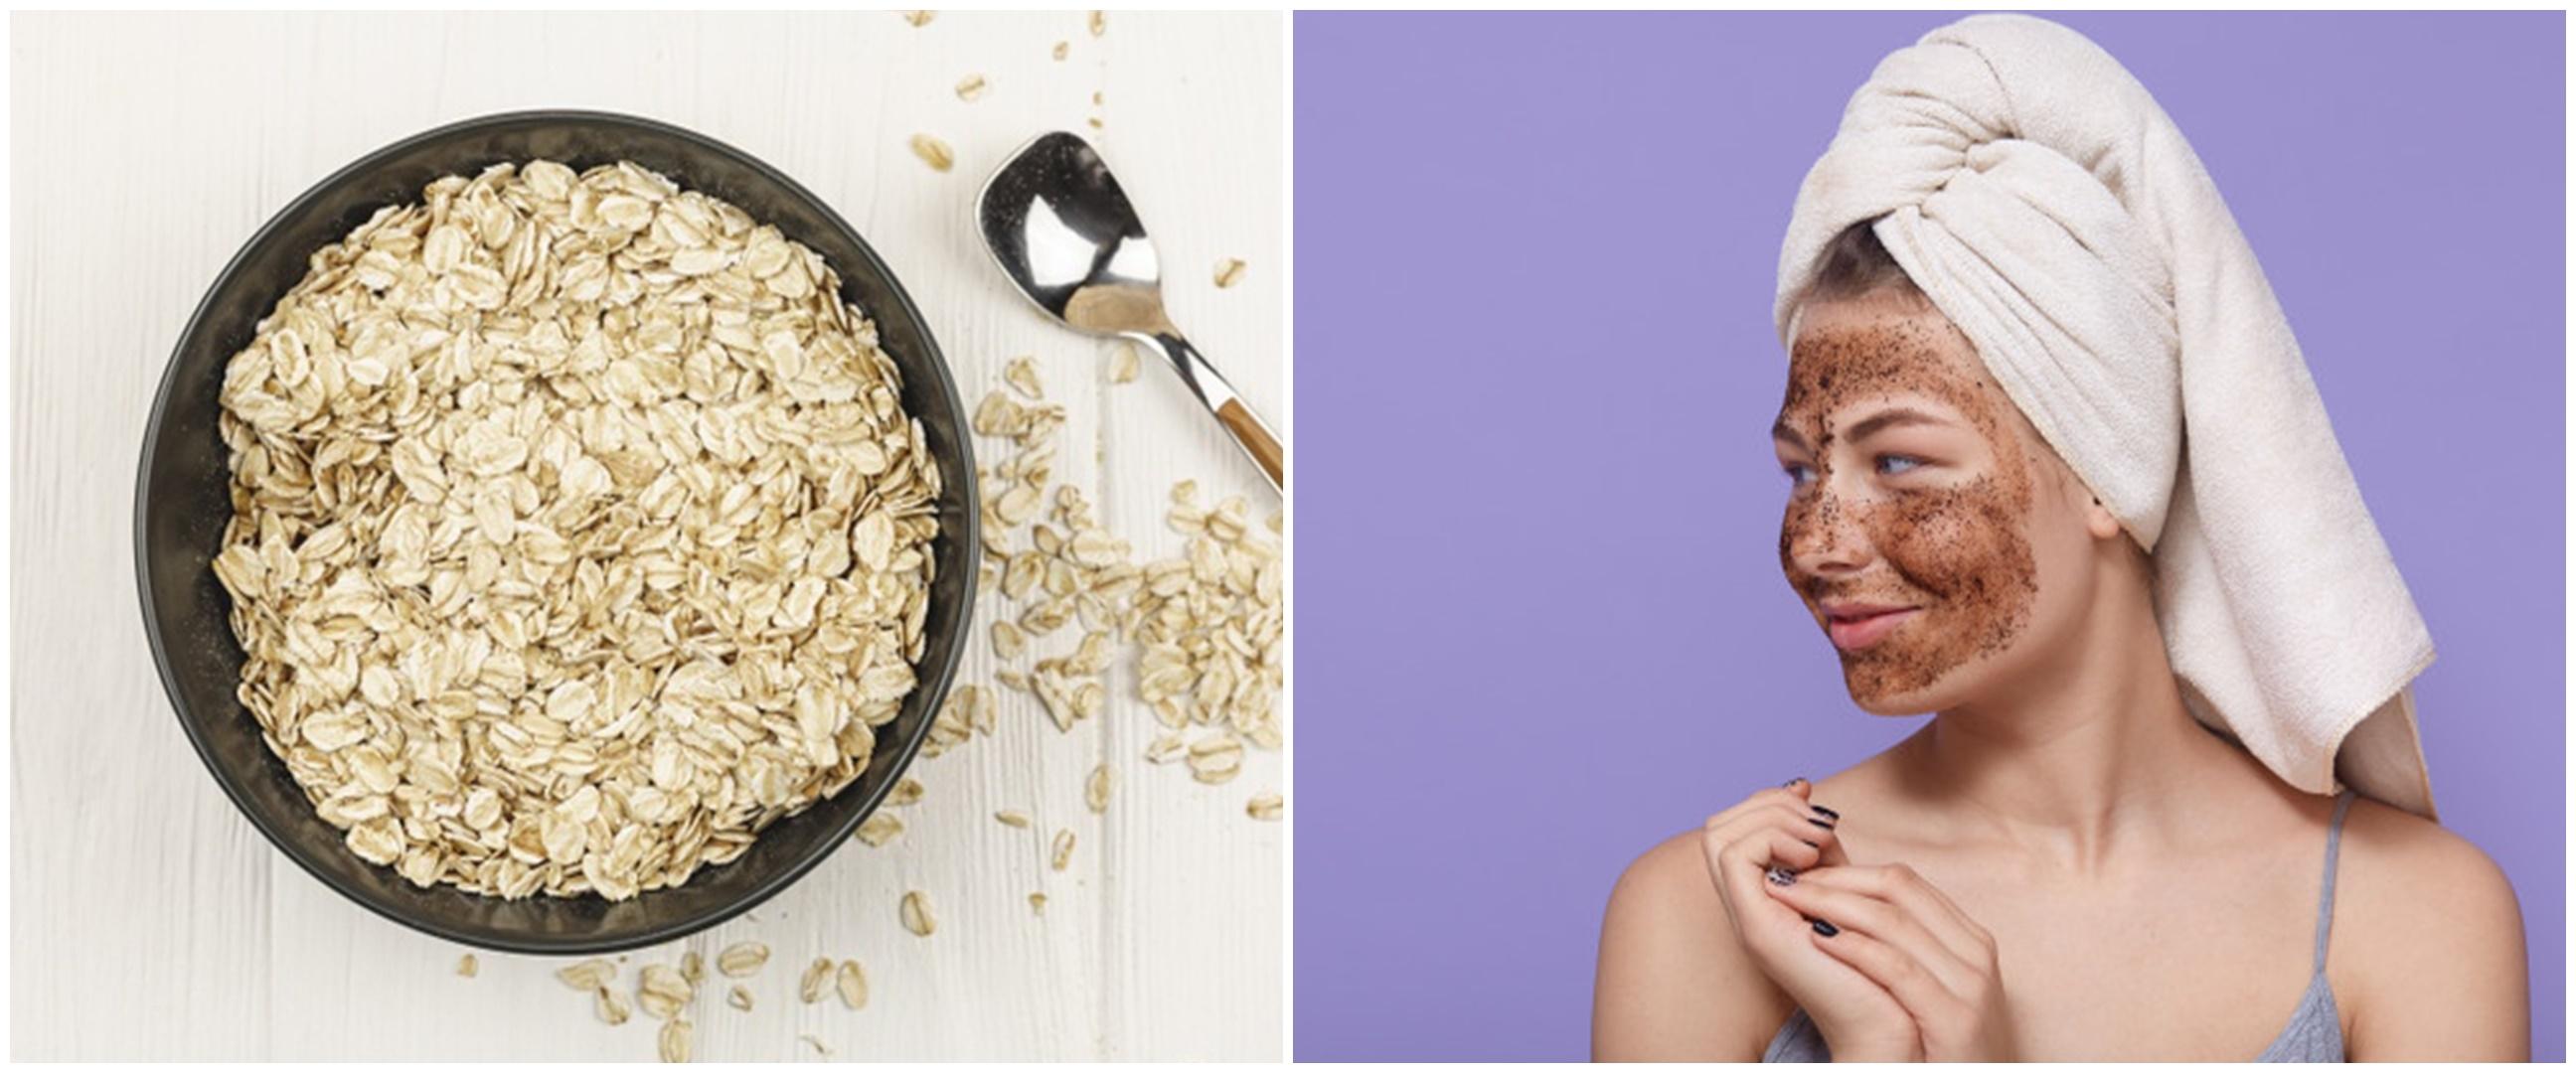 Cara membuat masker oatmeal dan kopi, bikin wajah glowing